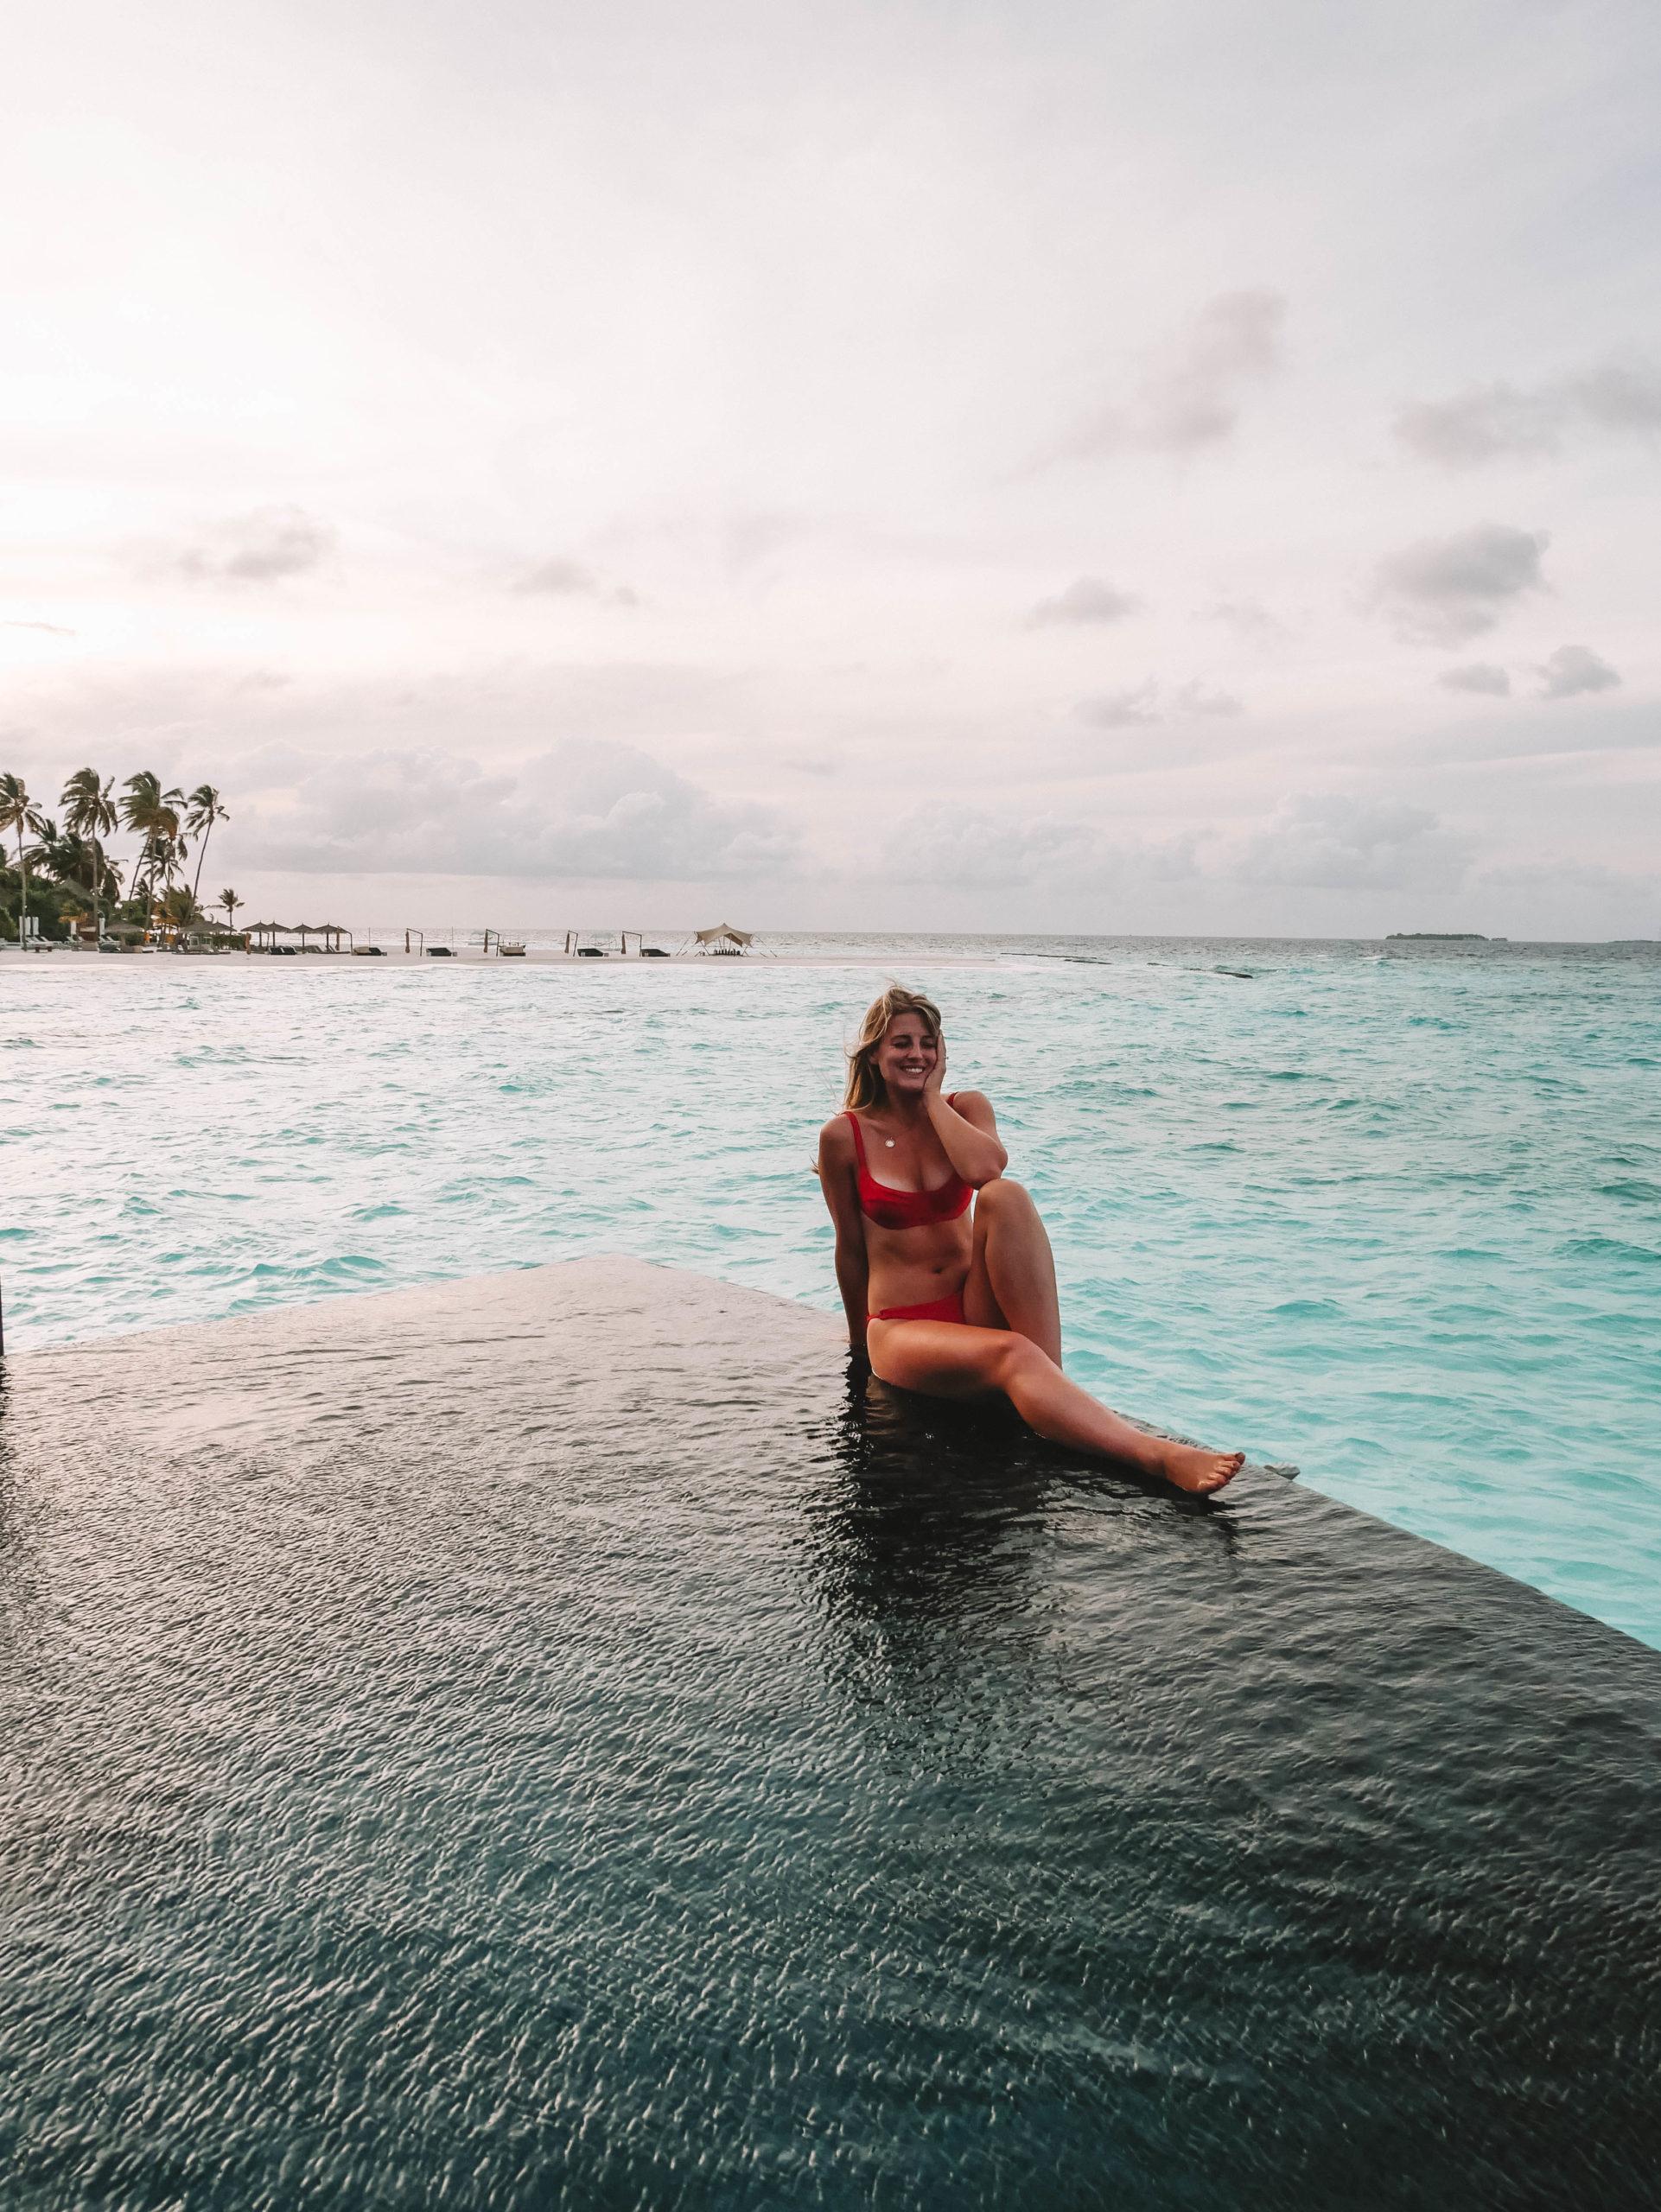 CONSTANCE HALAVELI // LUXURIOUS OVERWATER VILLAS IN THE MALDIVES